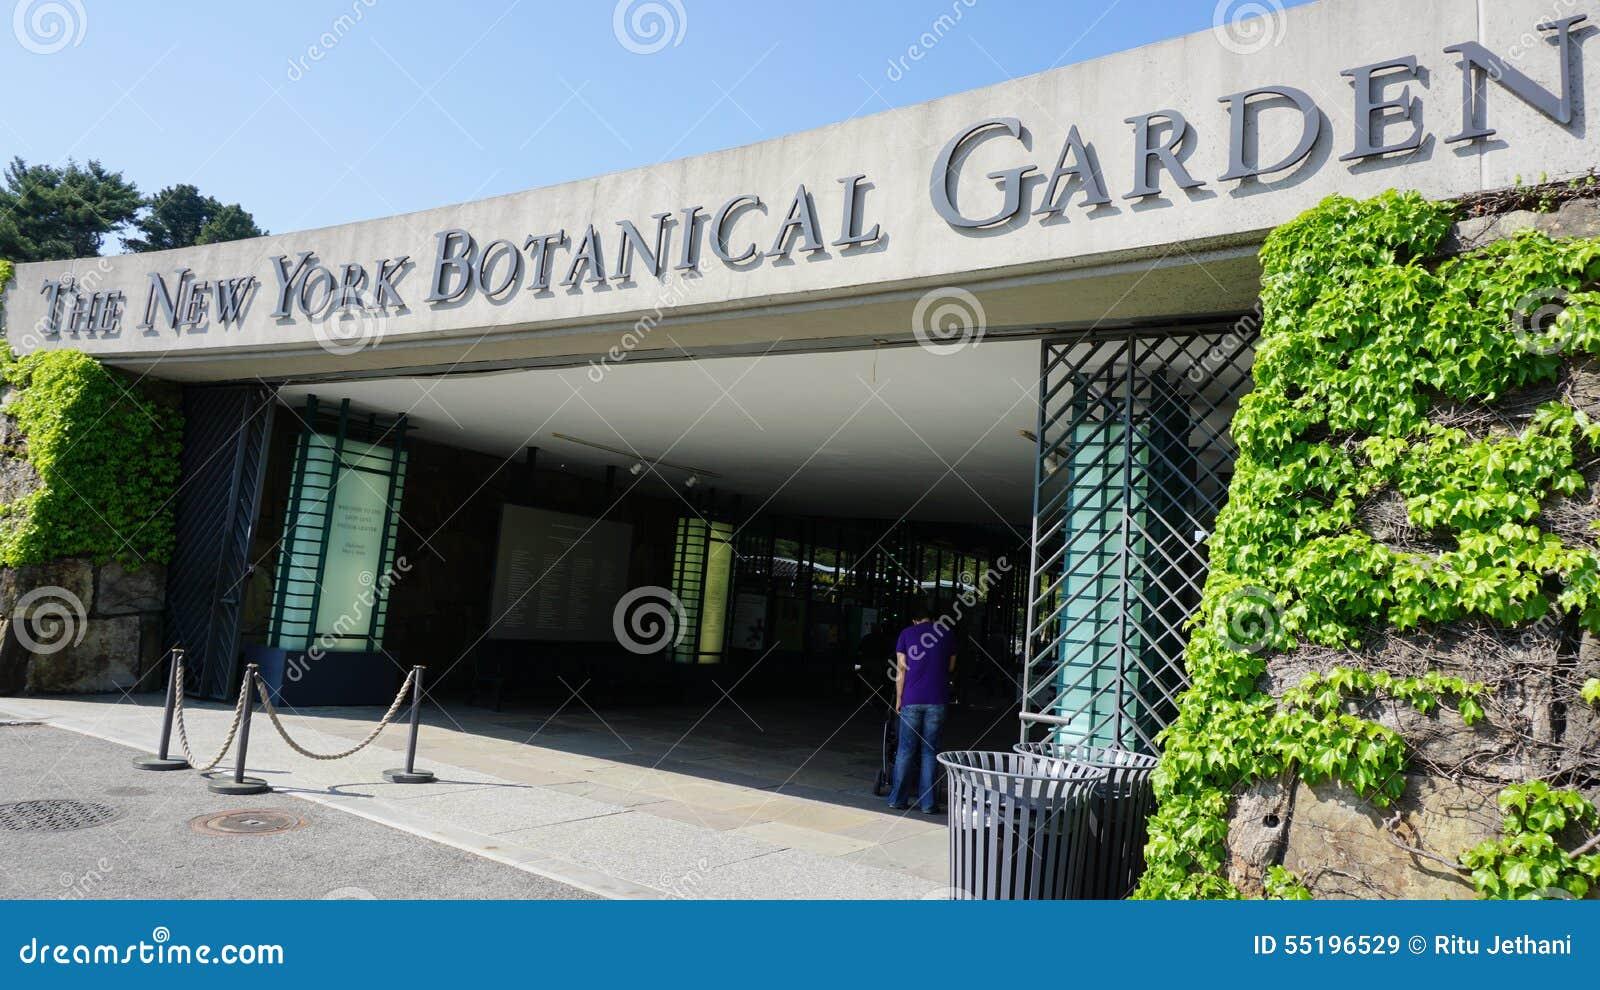 The New York Botanical Garden In Bronx New York Editorial